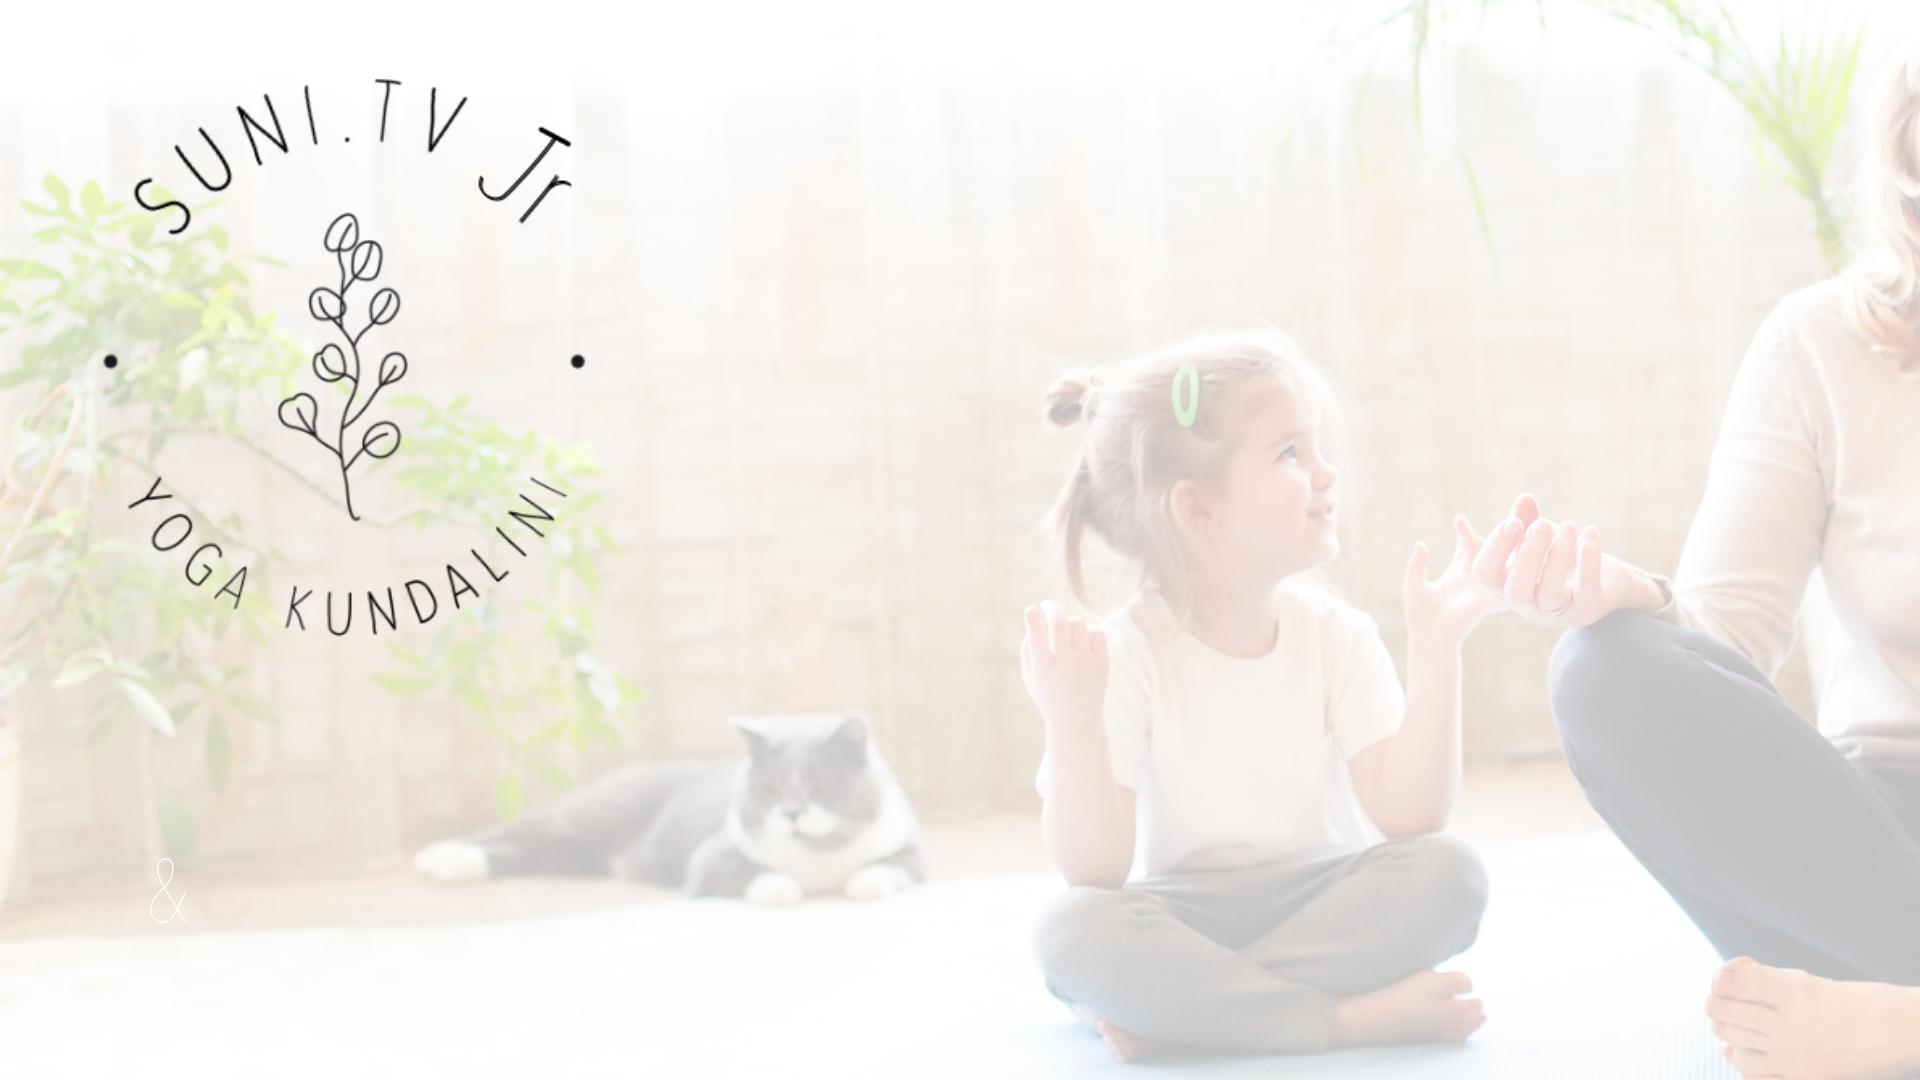 enfant yoga kundalini en français